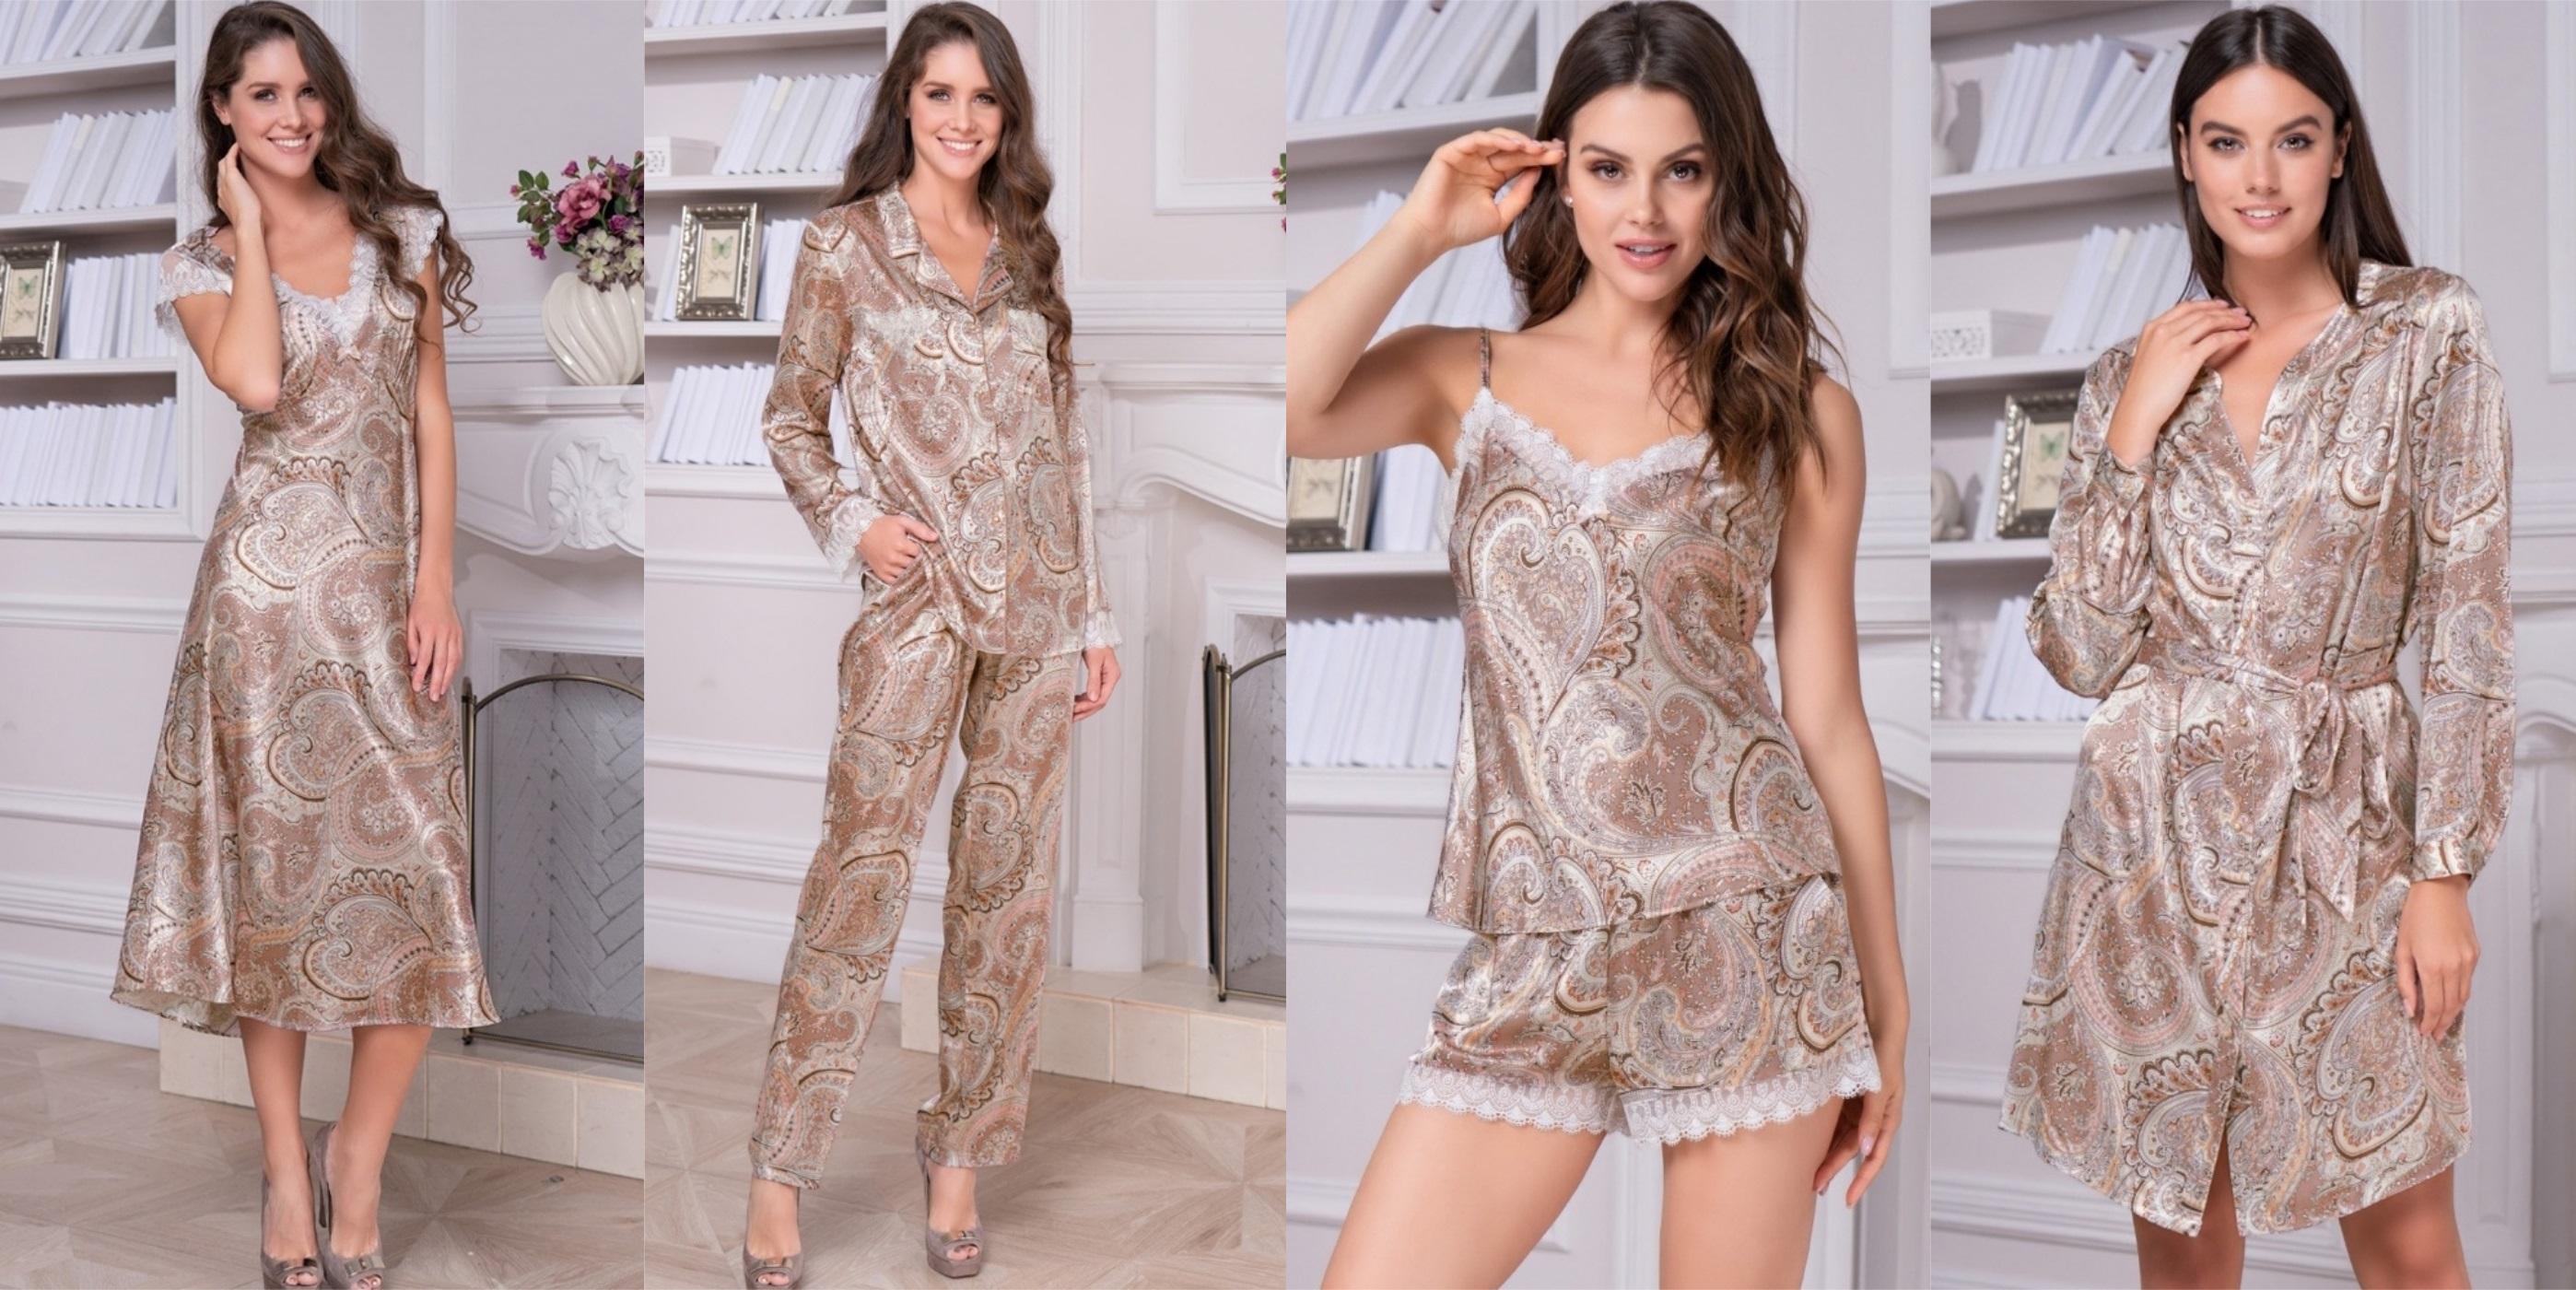 Ночная сорочка, пижама, одежда для жома Mia-Mia купить